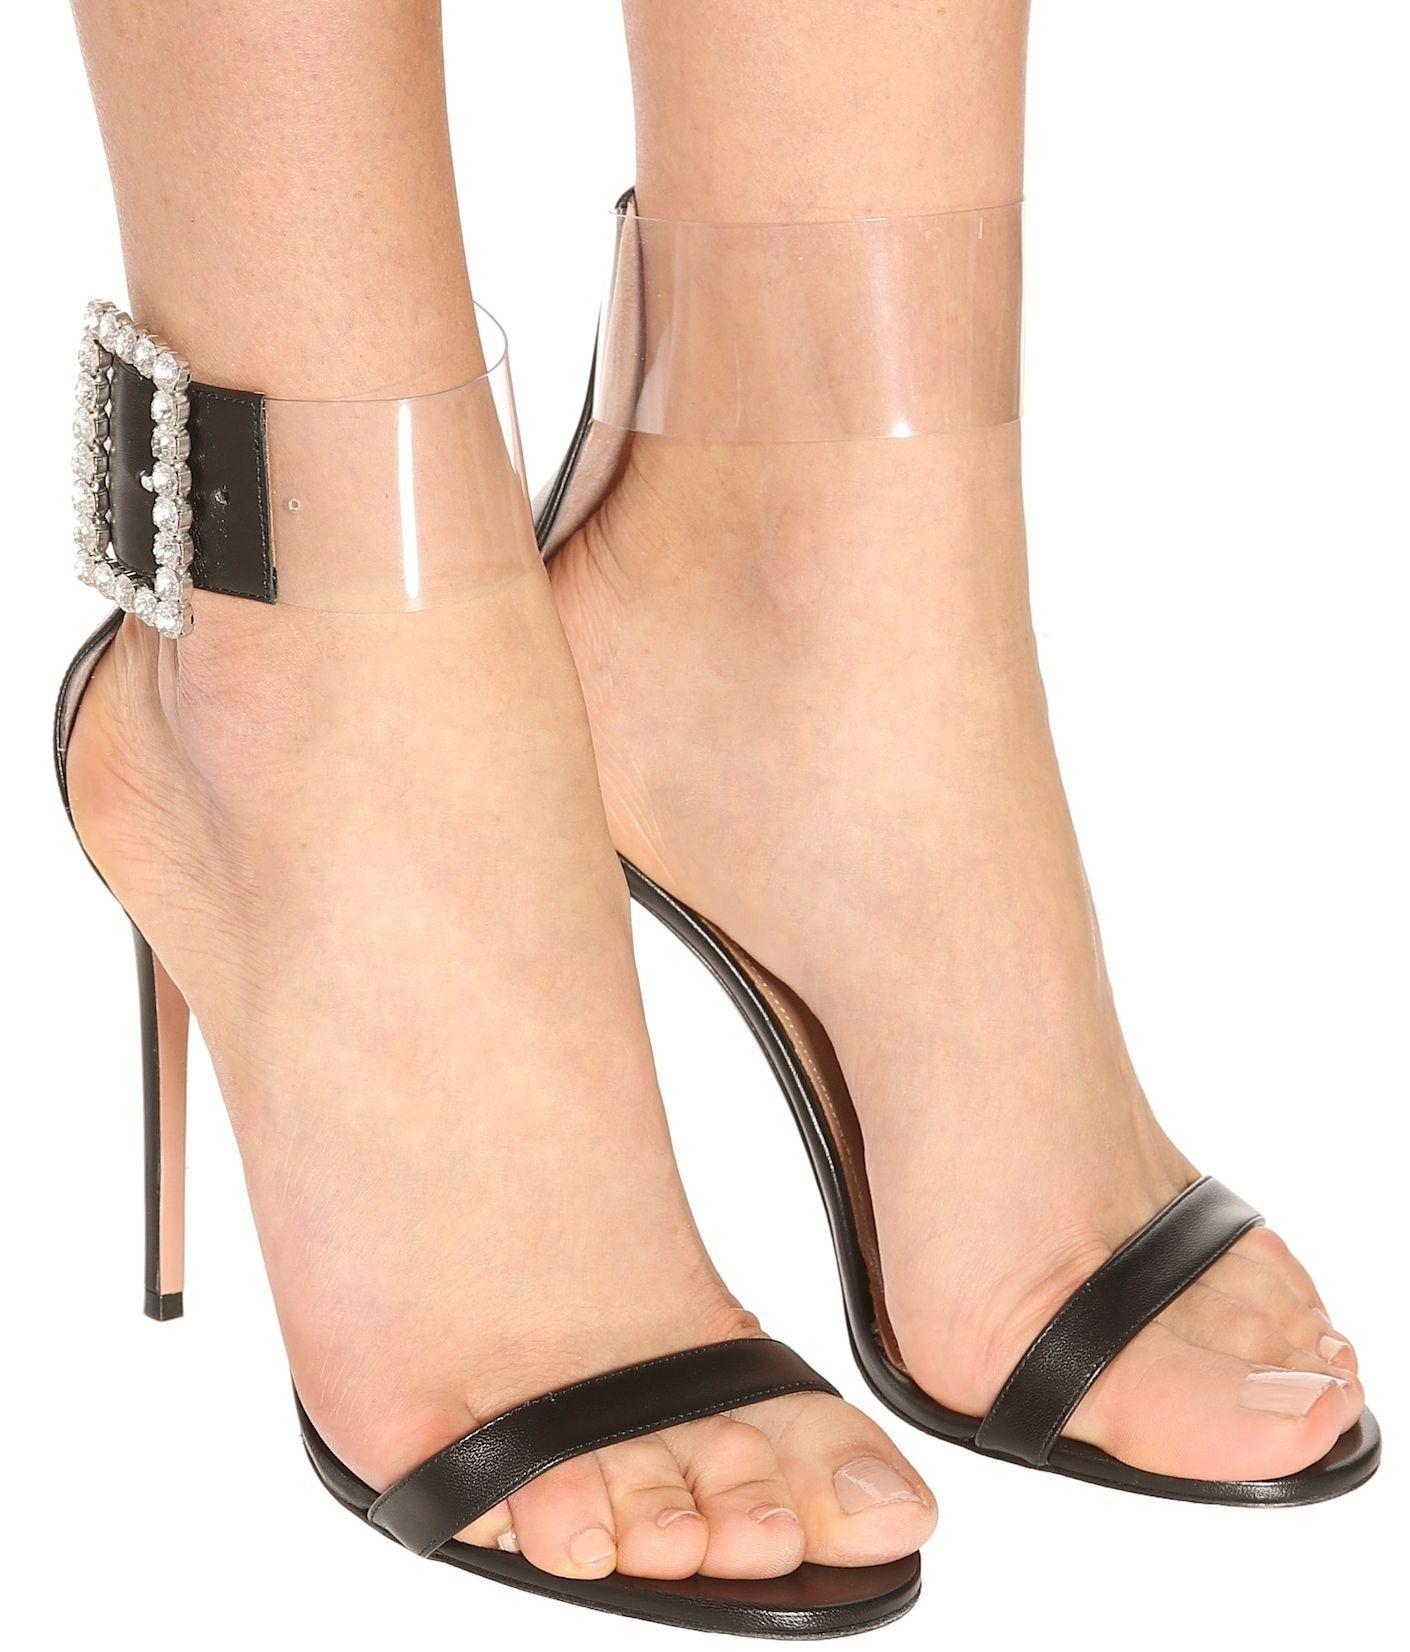 25677006ff0e Stand tall in Aquazzura s striking Casablanca sandals